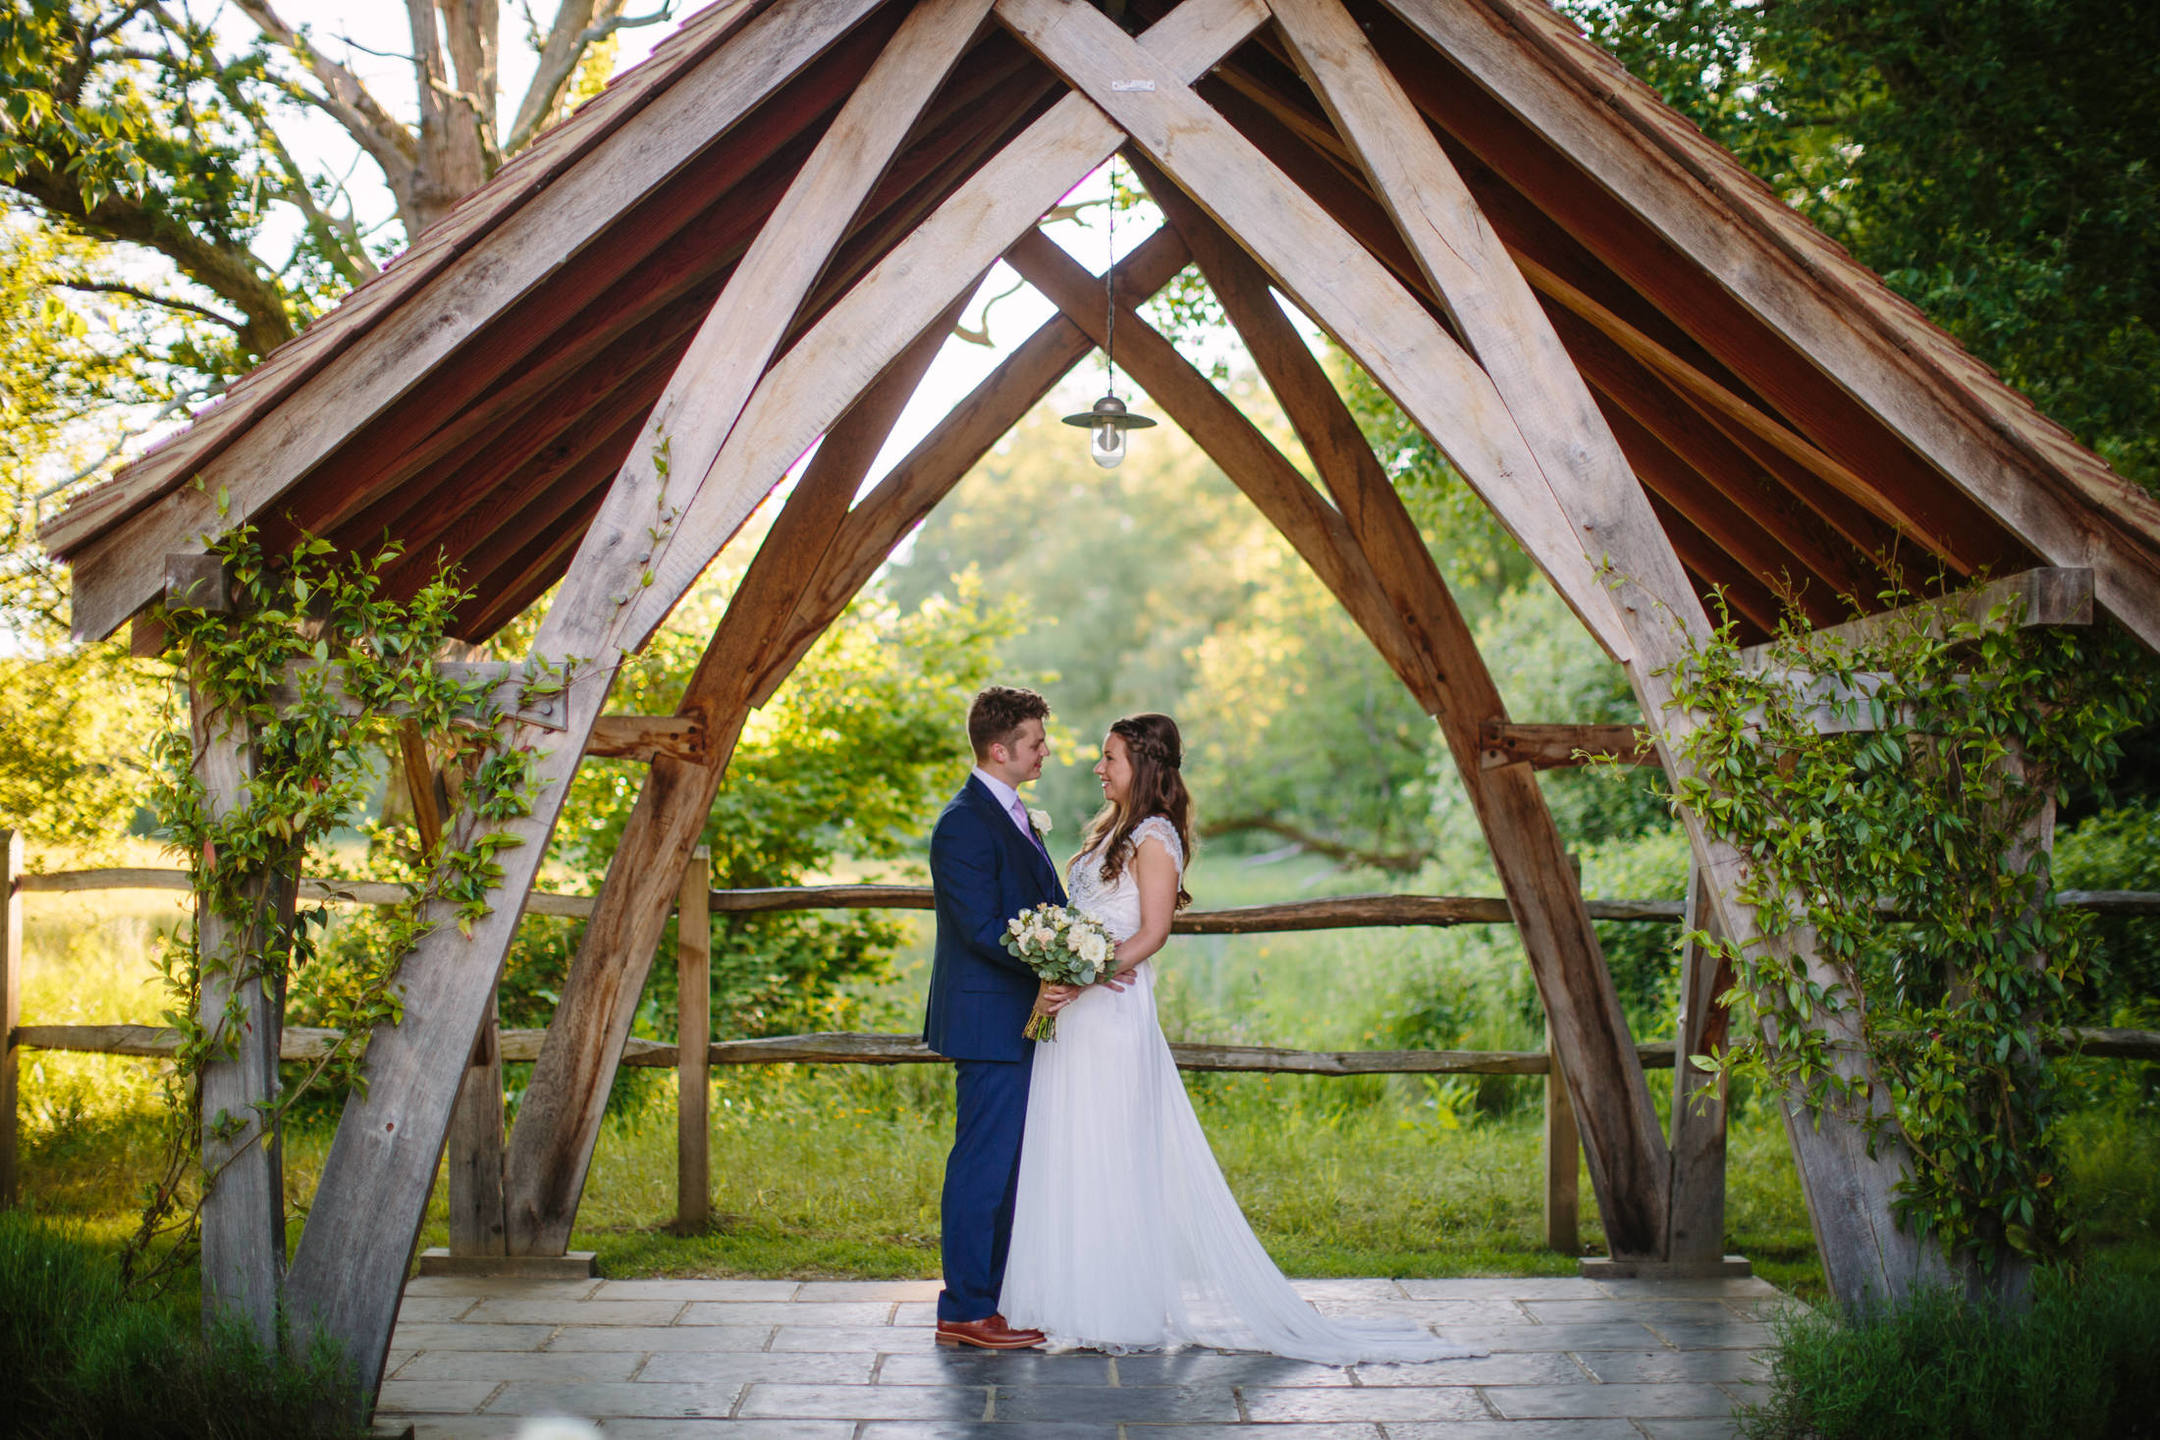 Millbridge Court Surrey Spring Wedding - Nisha Haq Photography